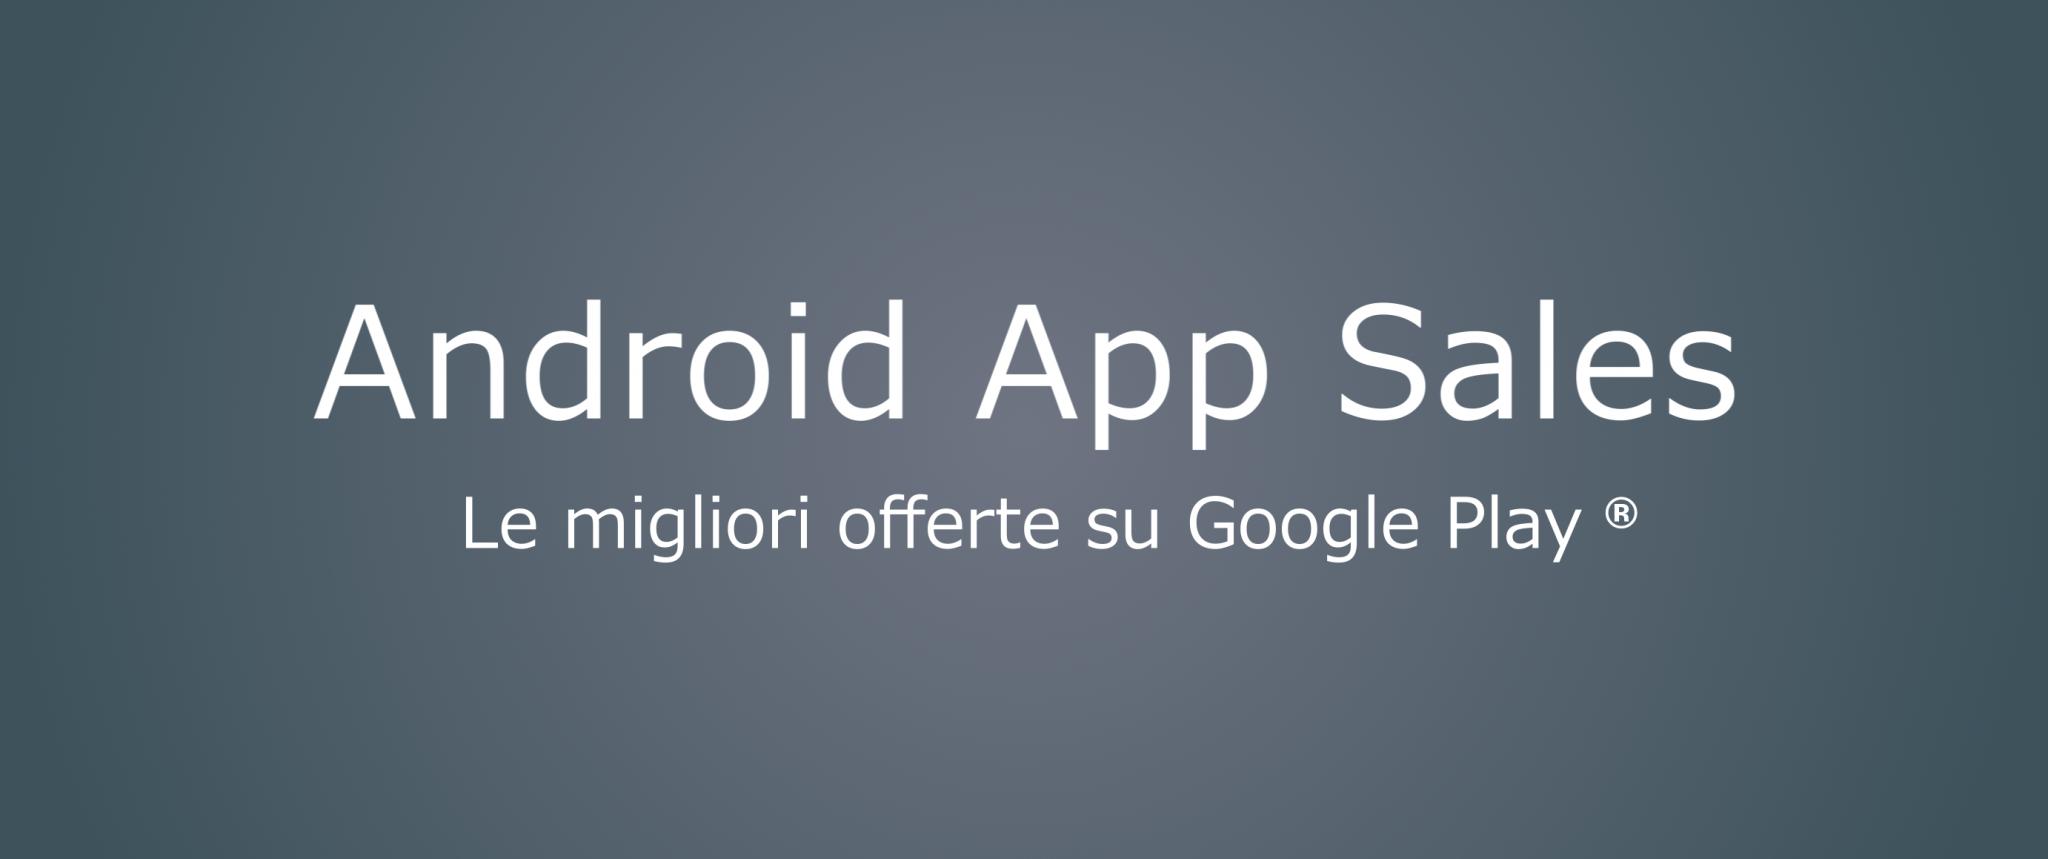 android-app-sales-avrmagazine